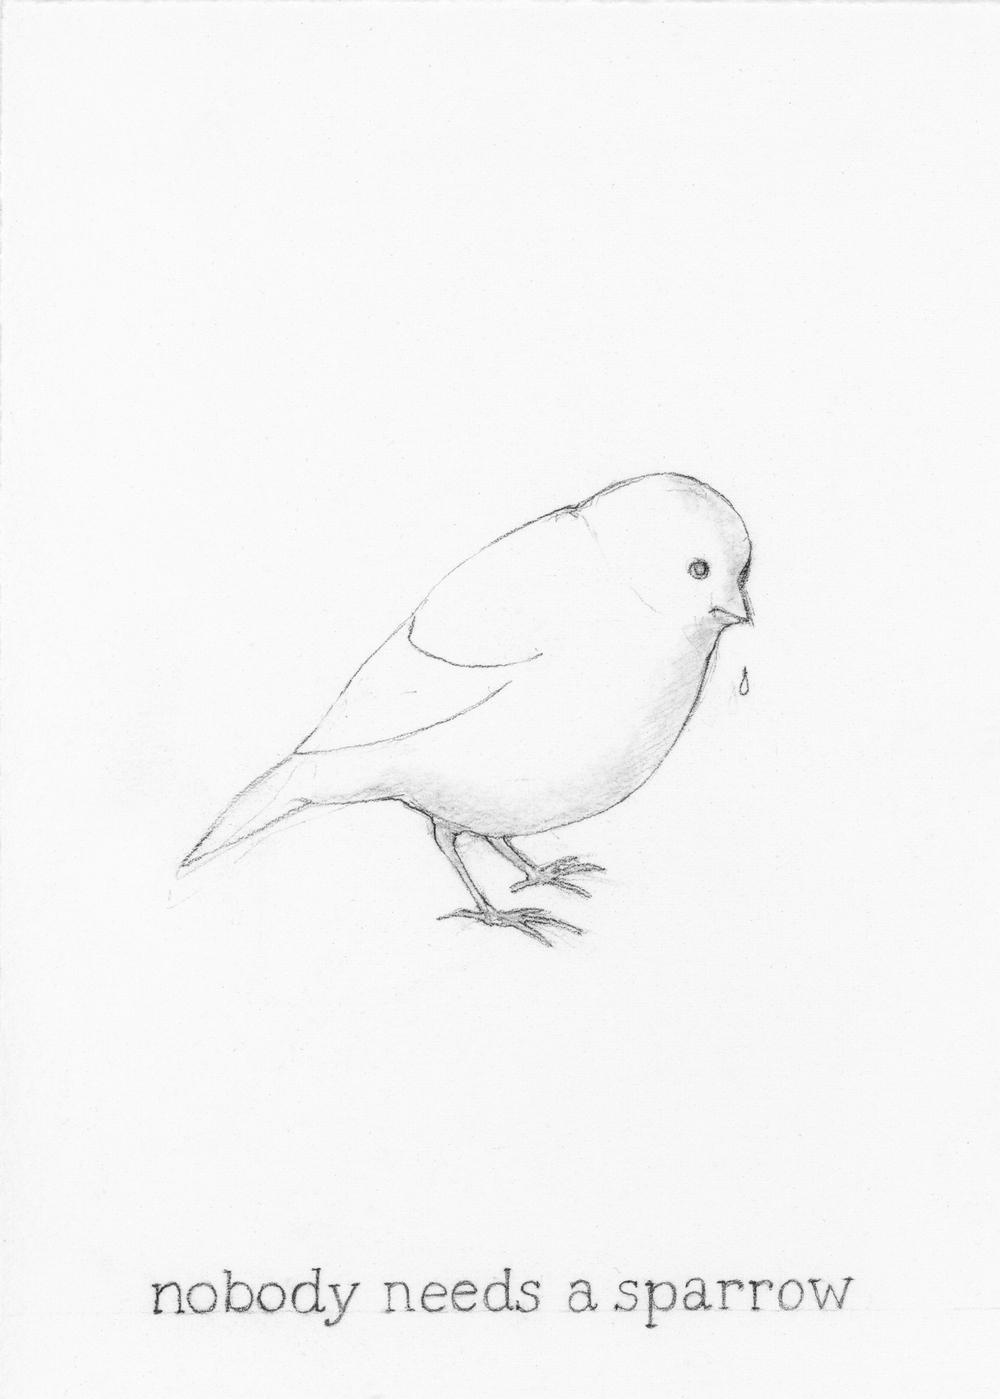 Nobody needs a sparrow